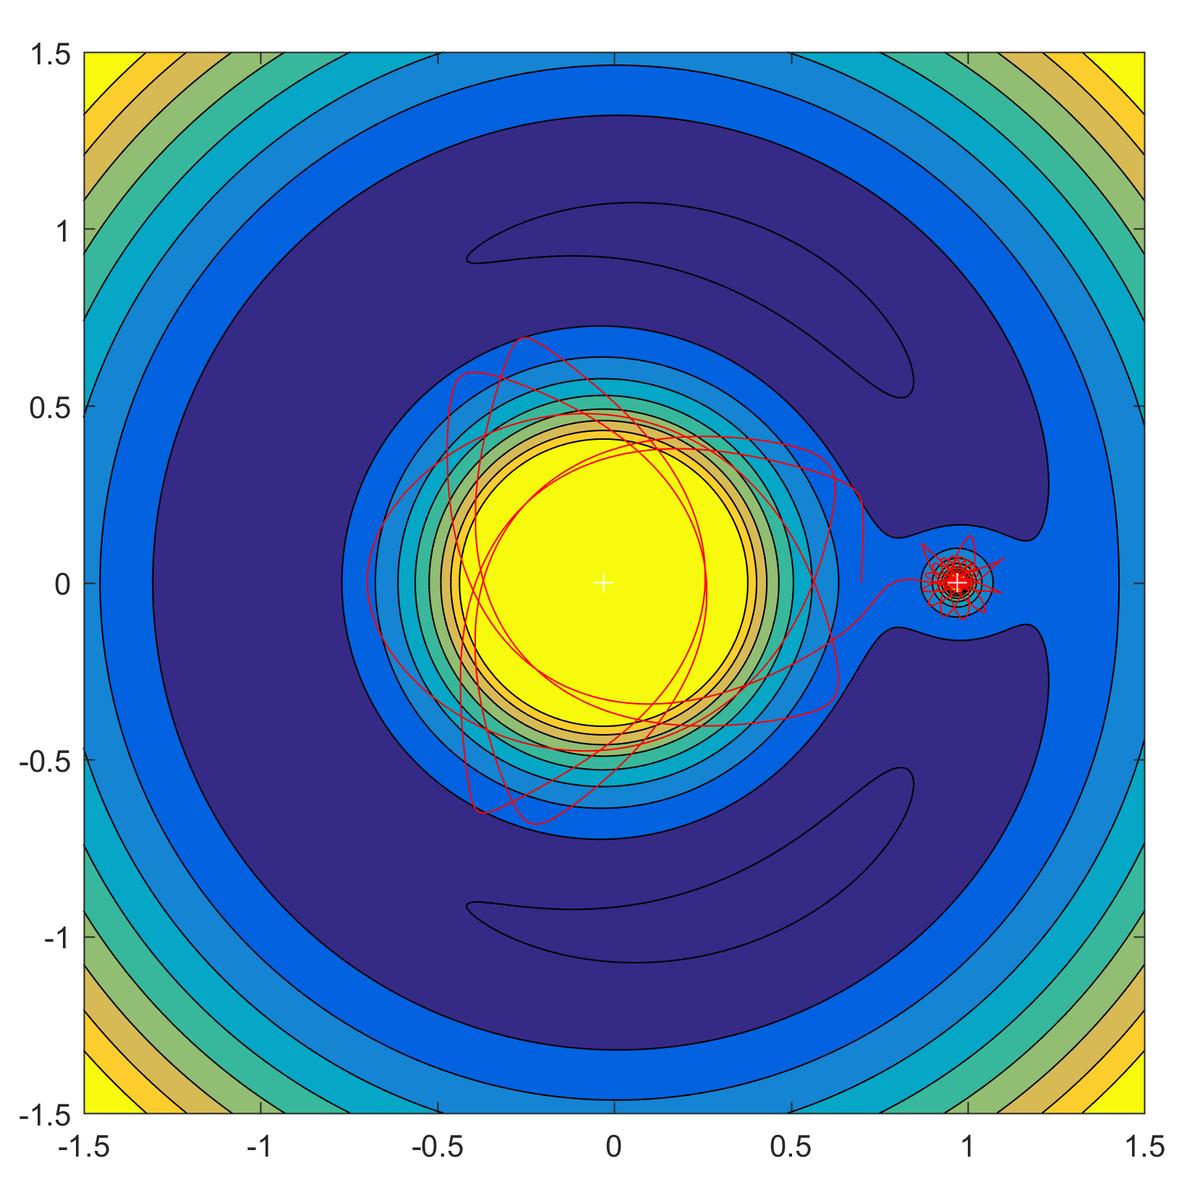 Zero-velocity surface